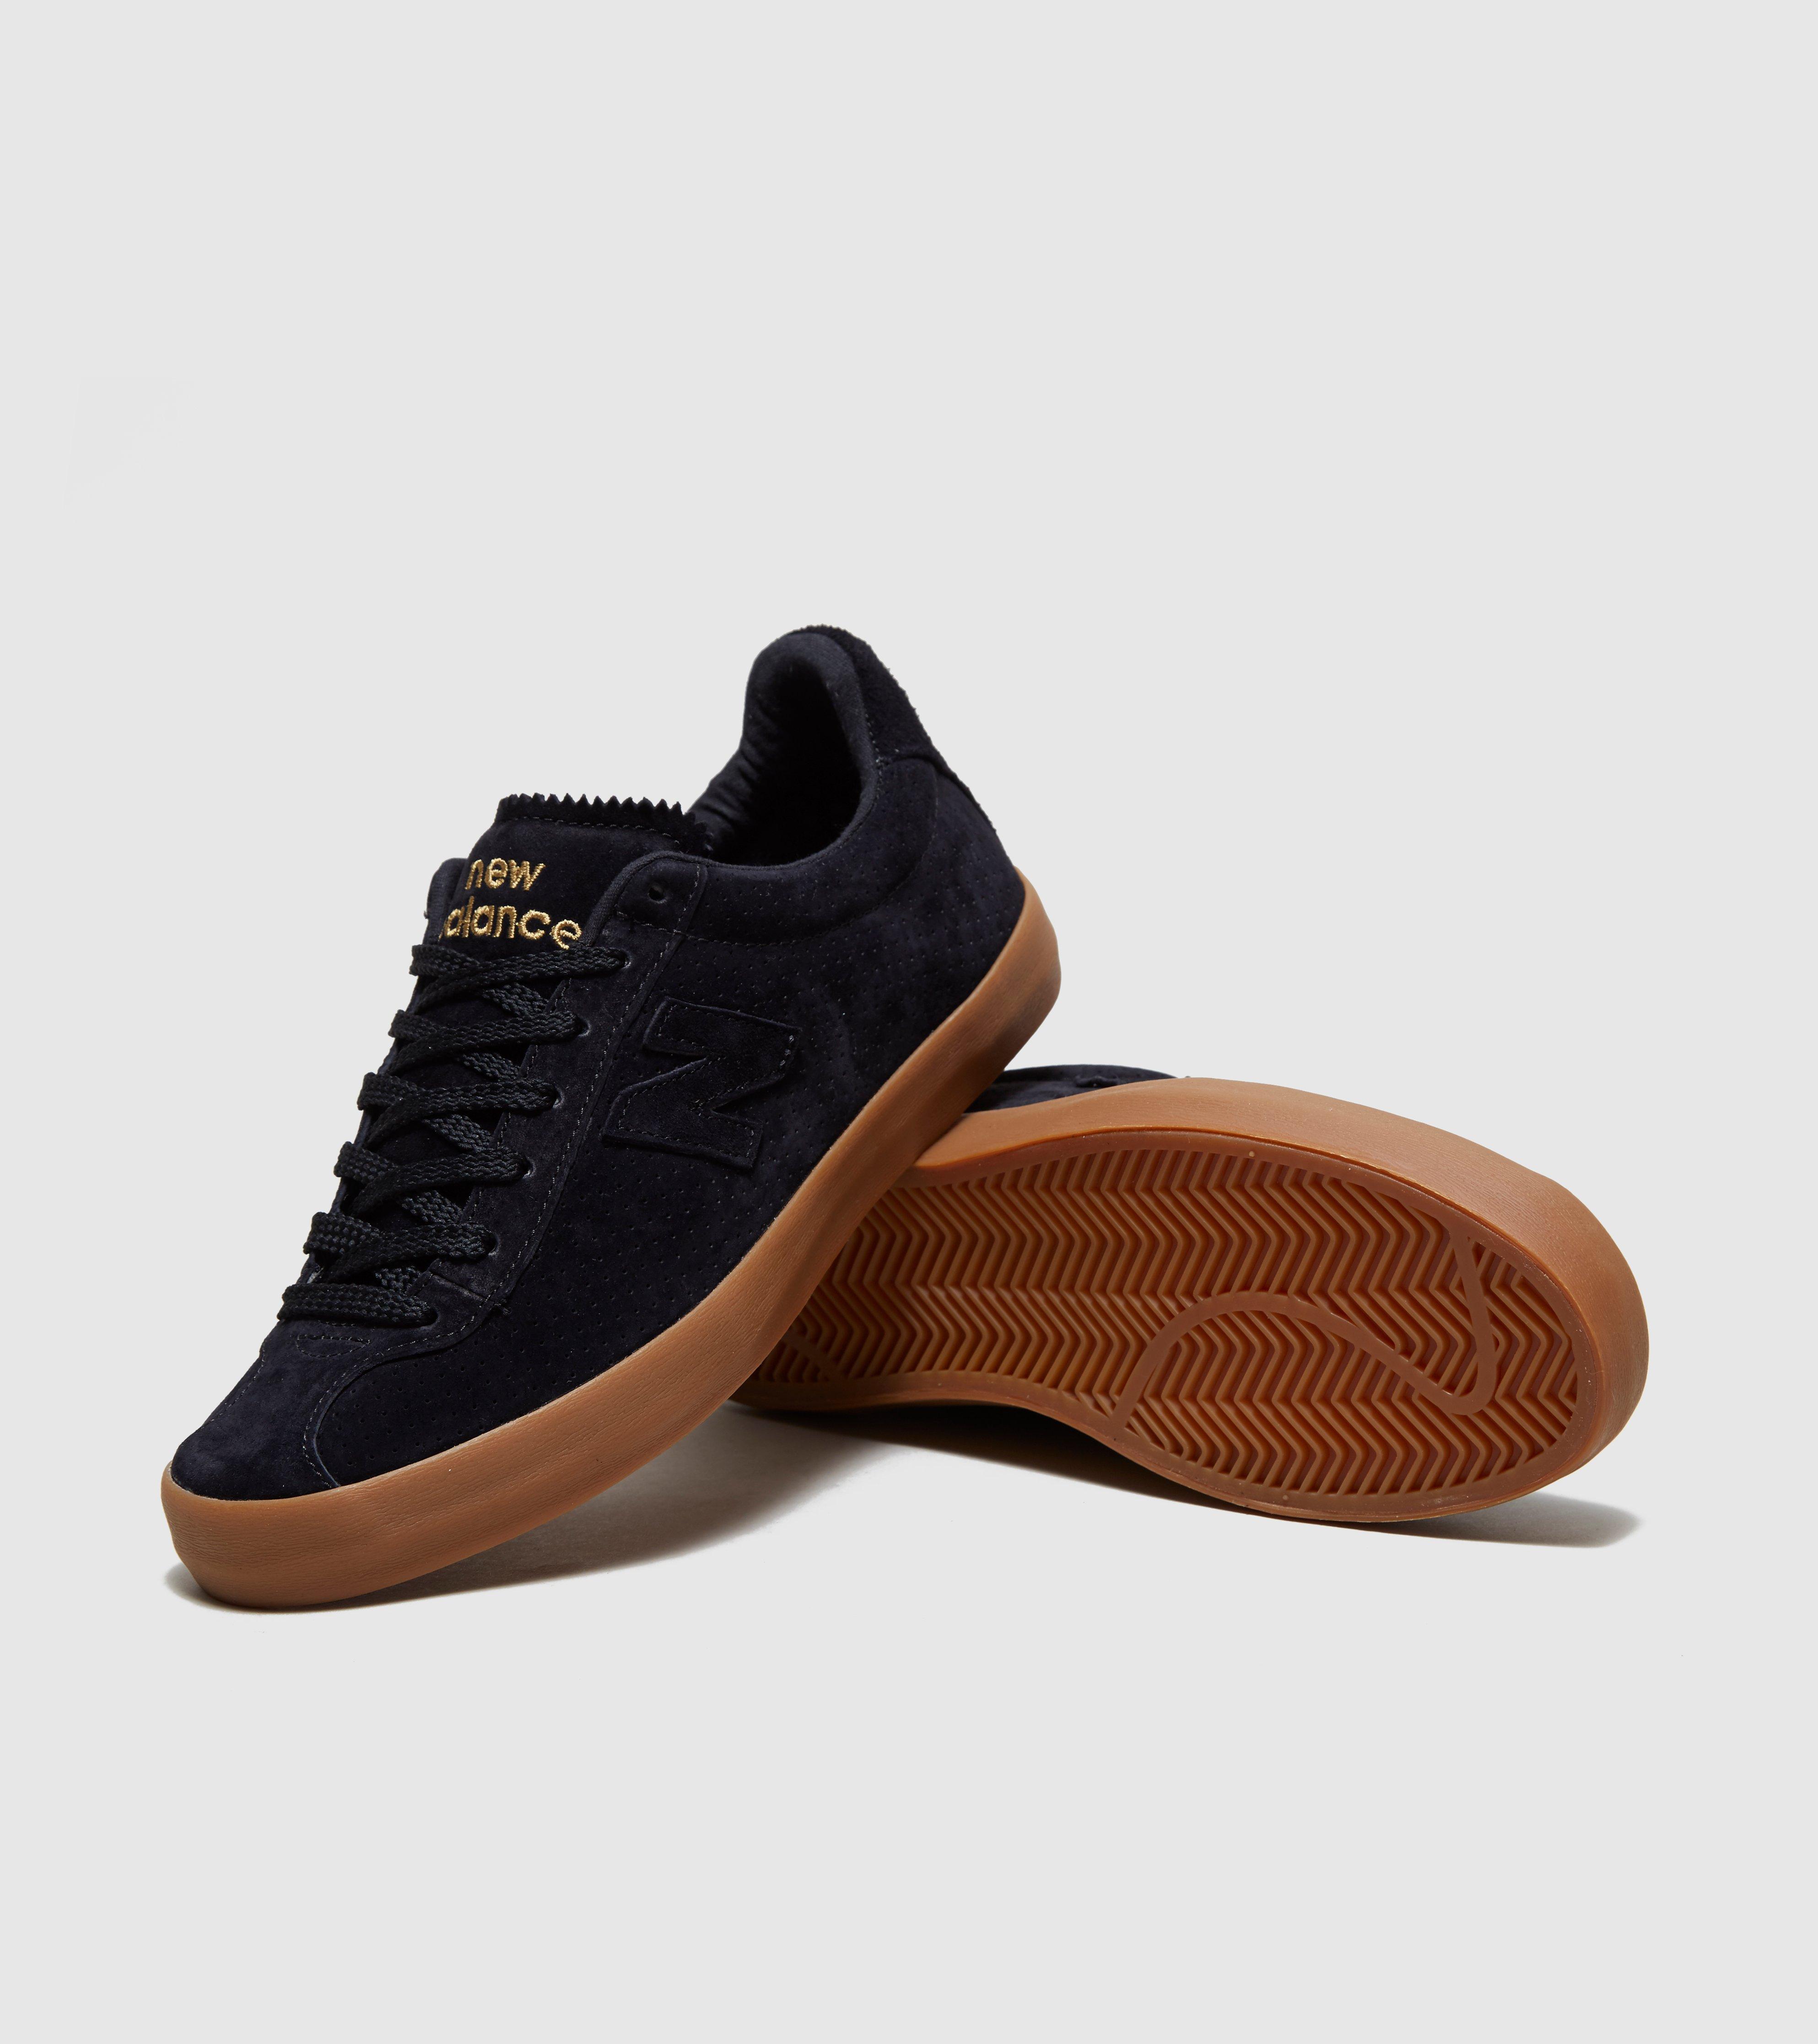 New Balance Tempus Shoes